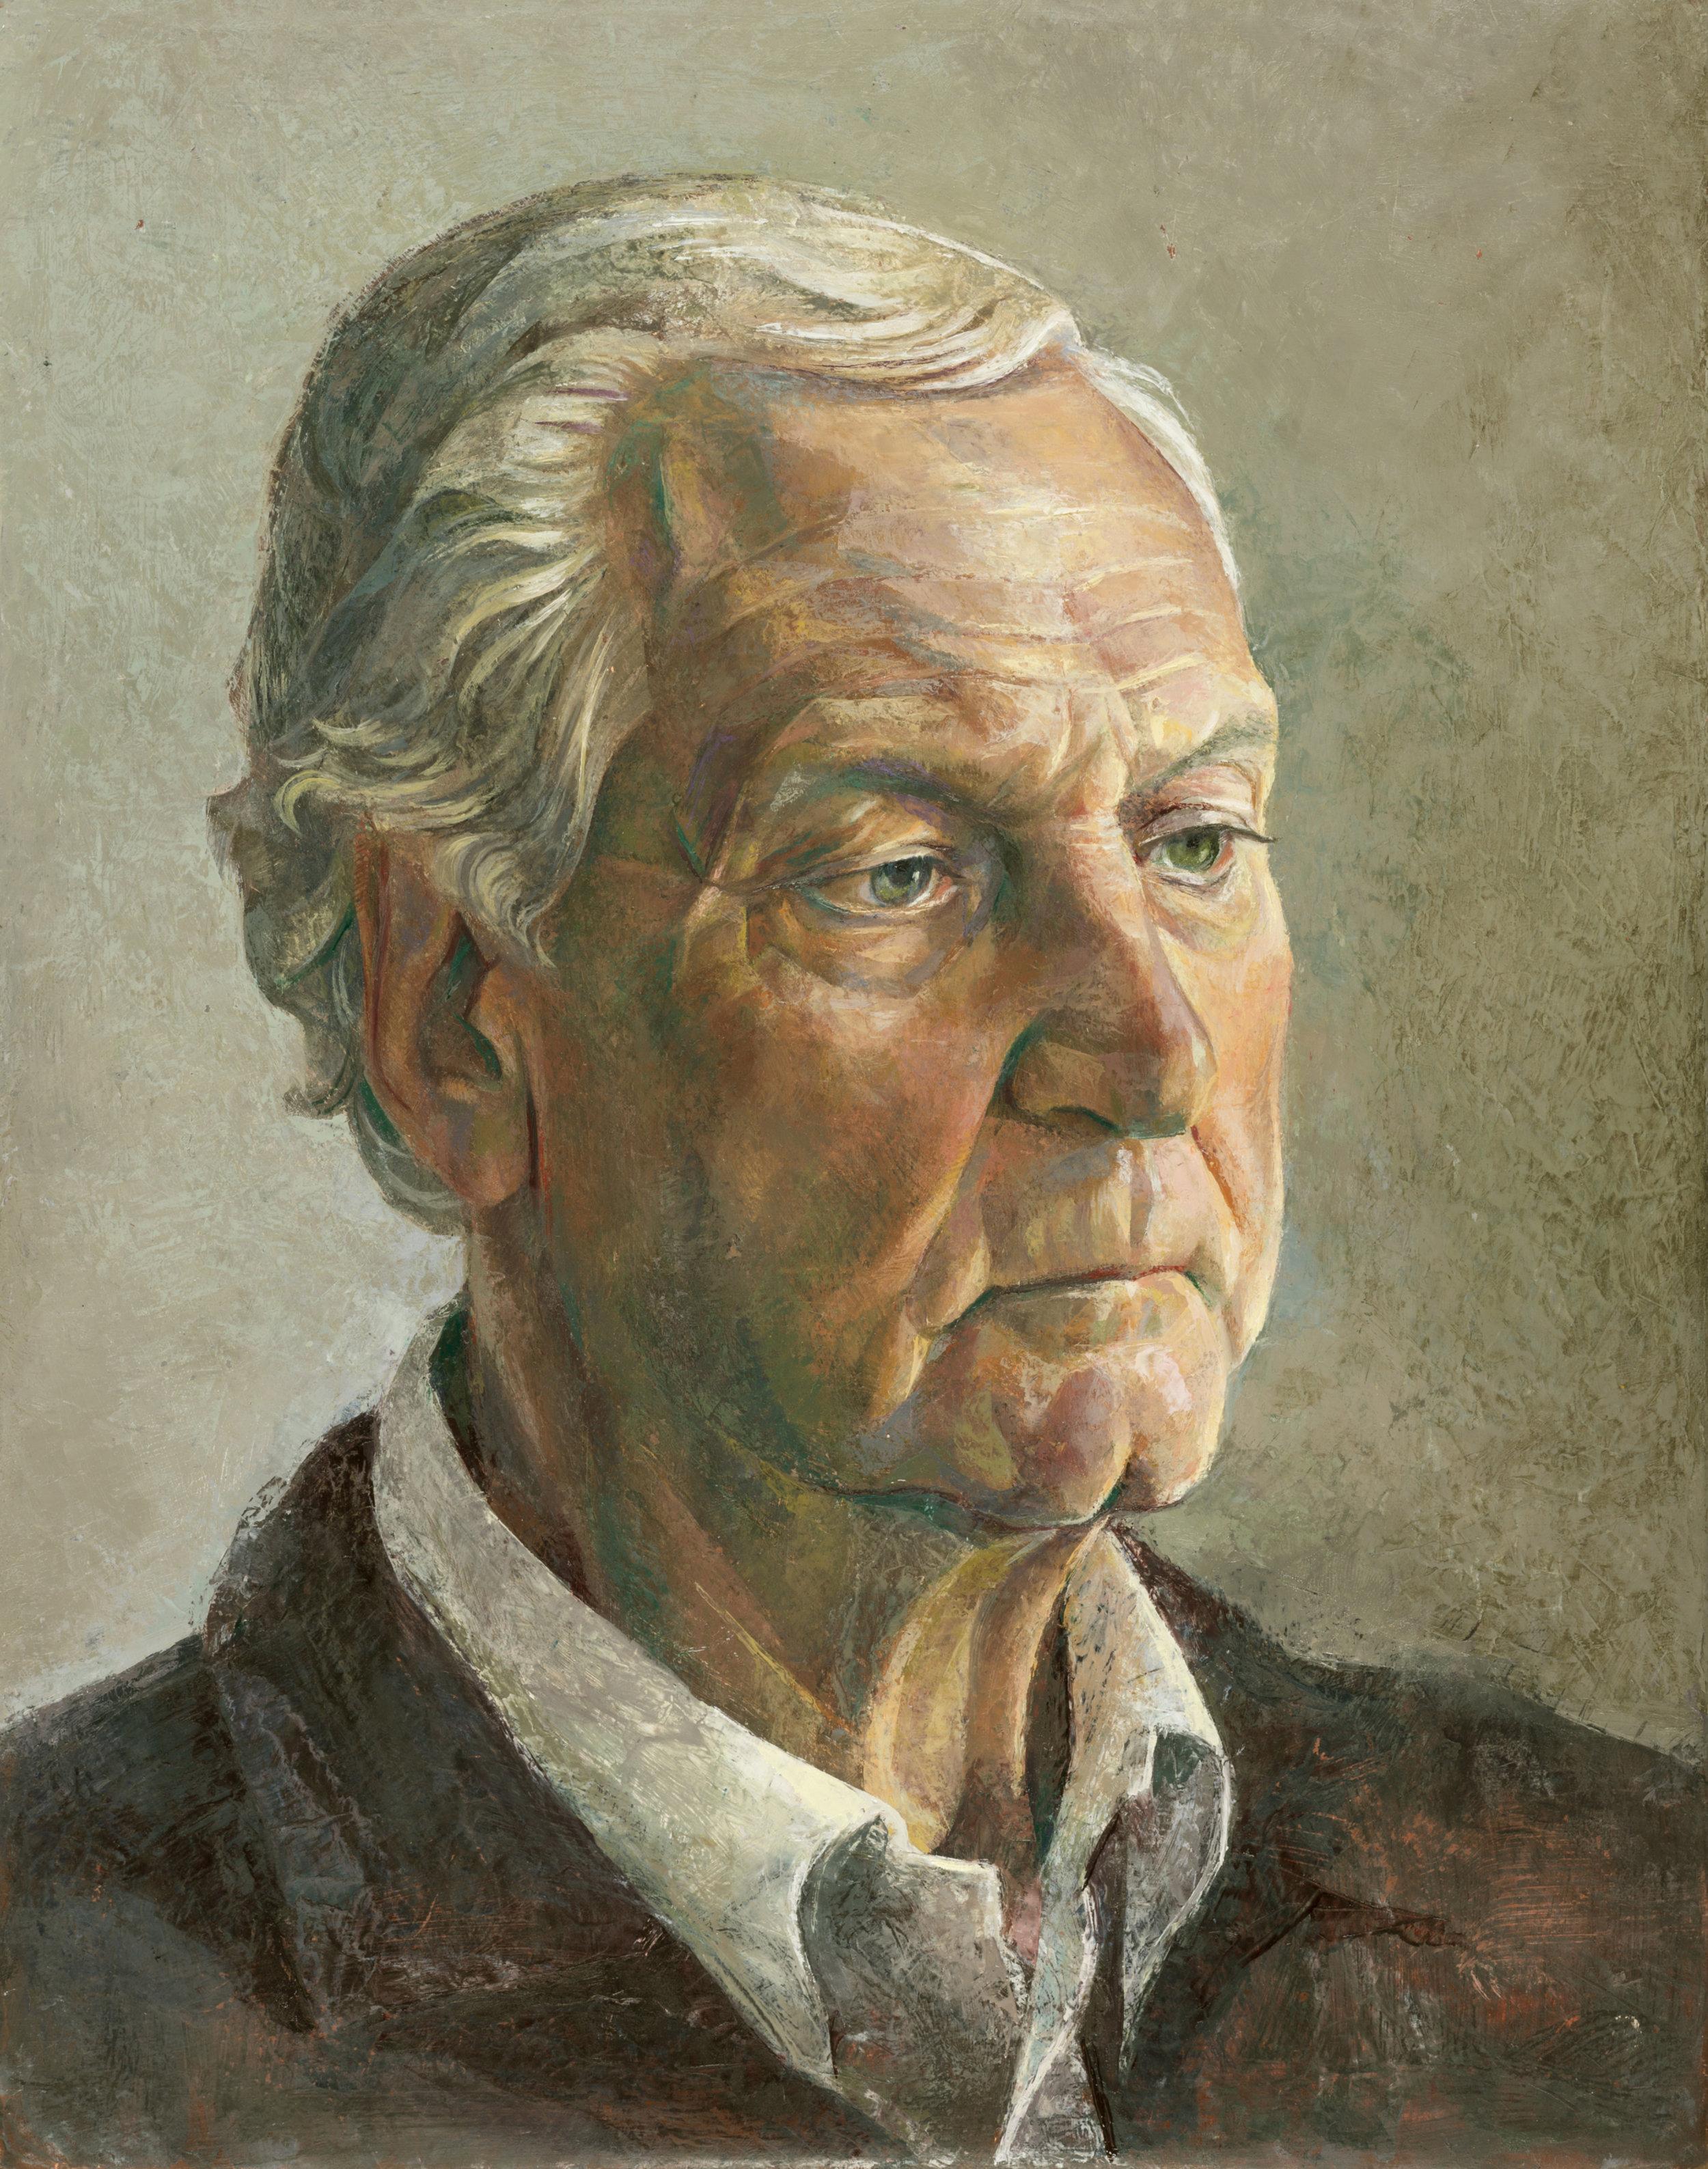 'Portrait of Dad' 47x40cm oil on gesso panel